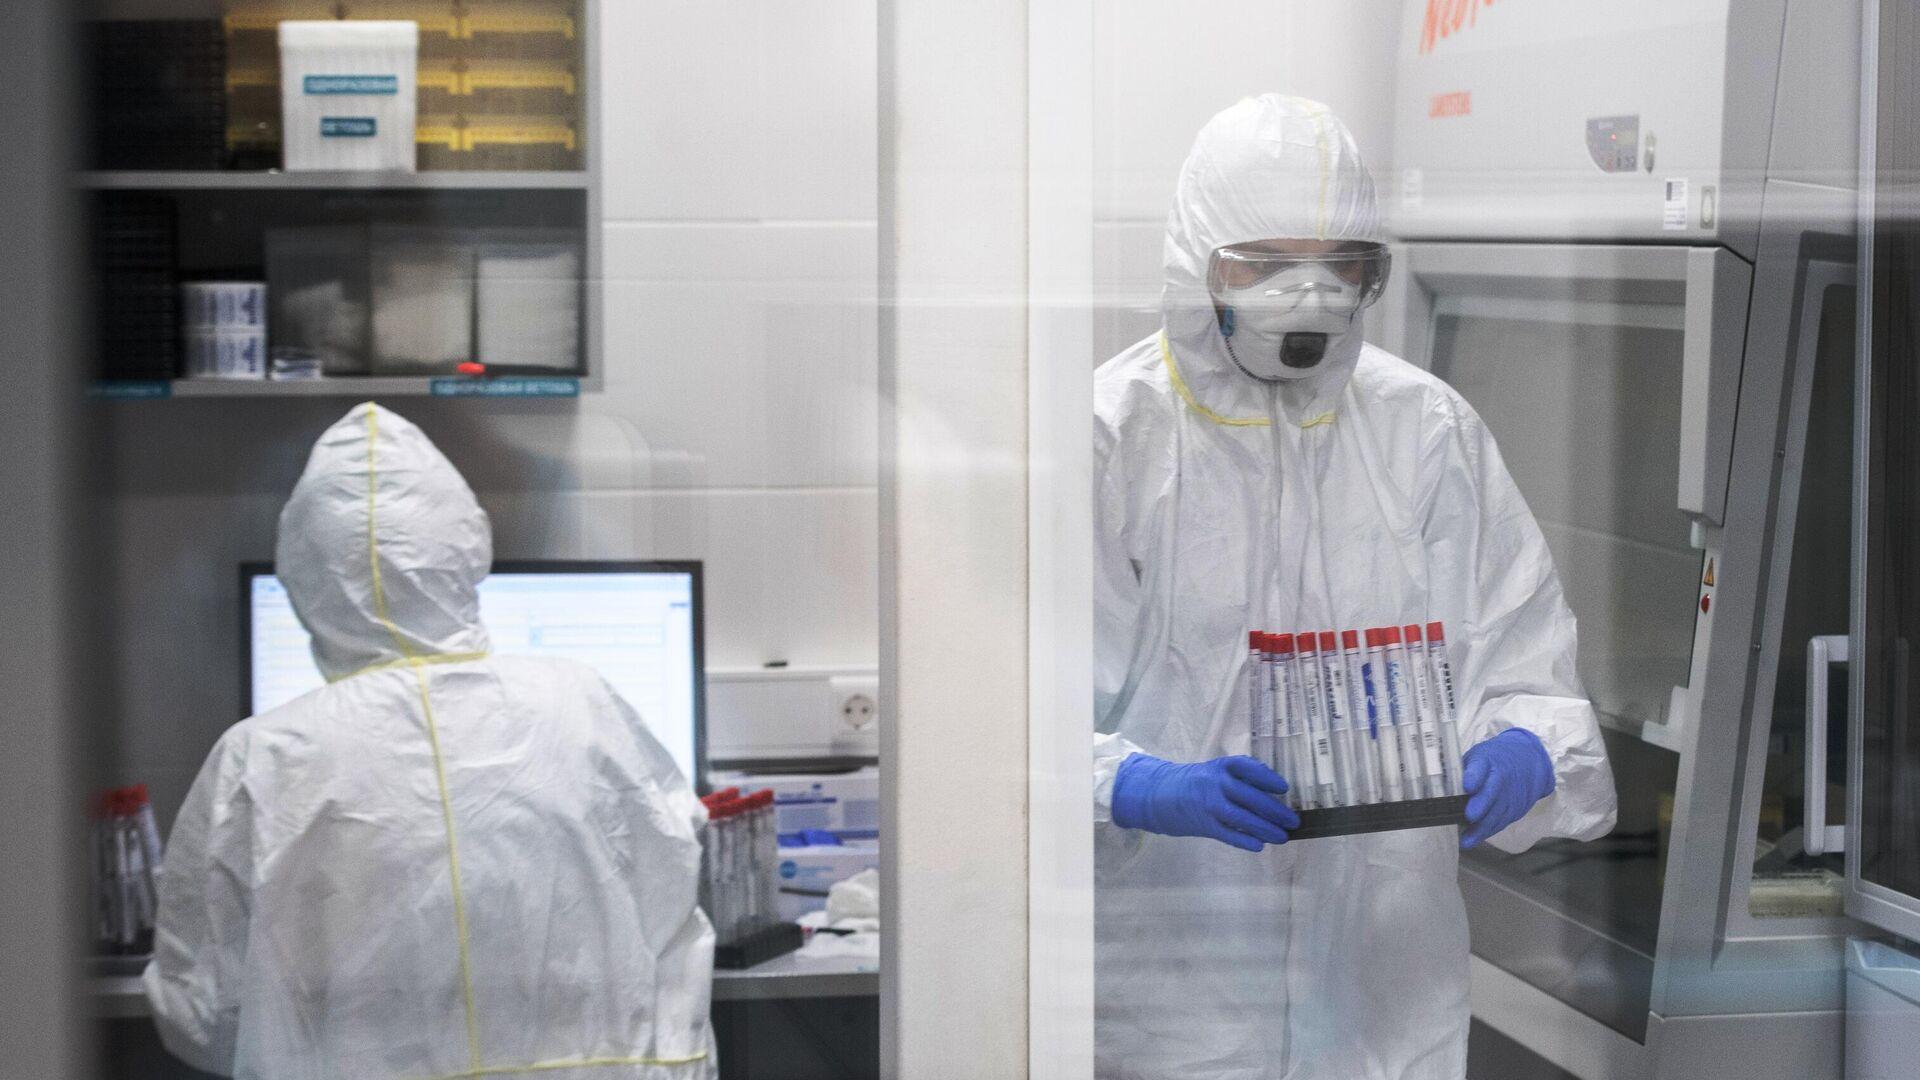 Сотрудники лаборатории Инвитро проводят тесты на коронавирус - РИА Новости, 1920, 16.01.2021